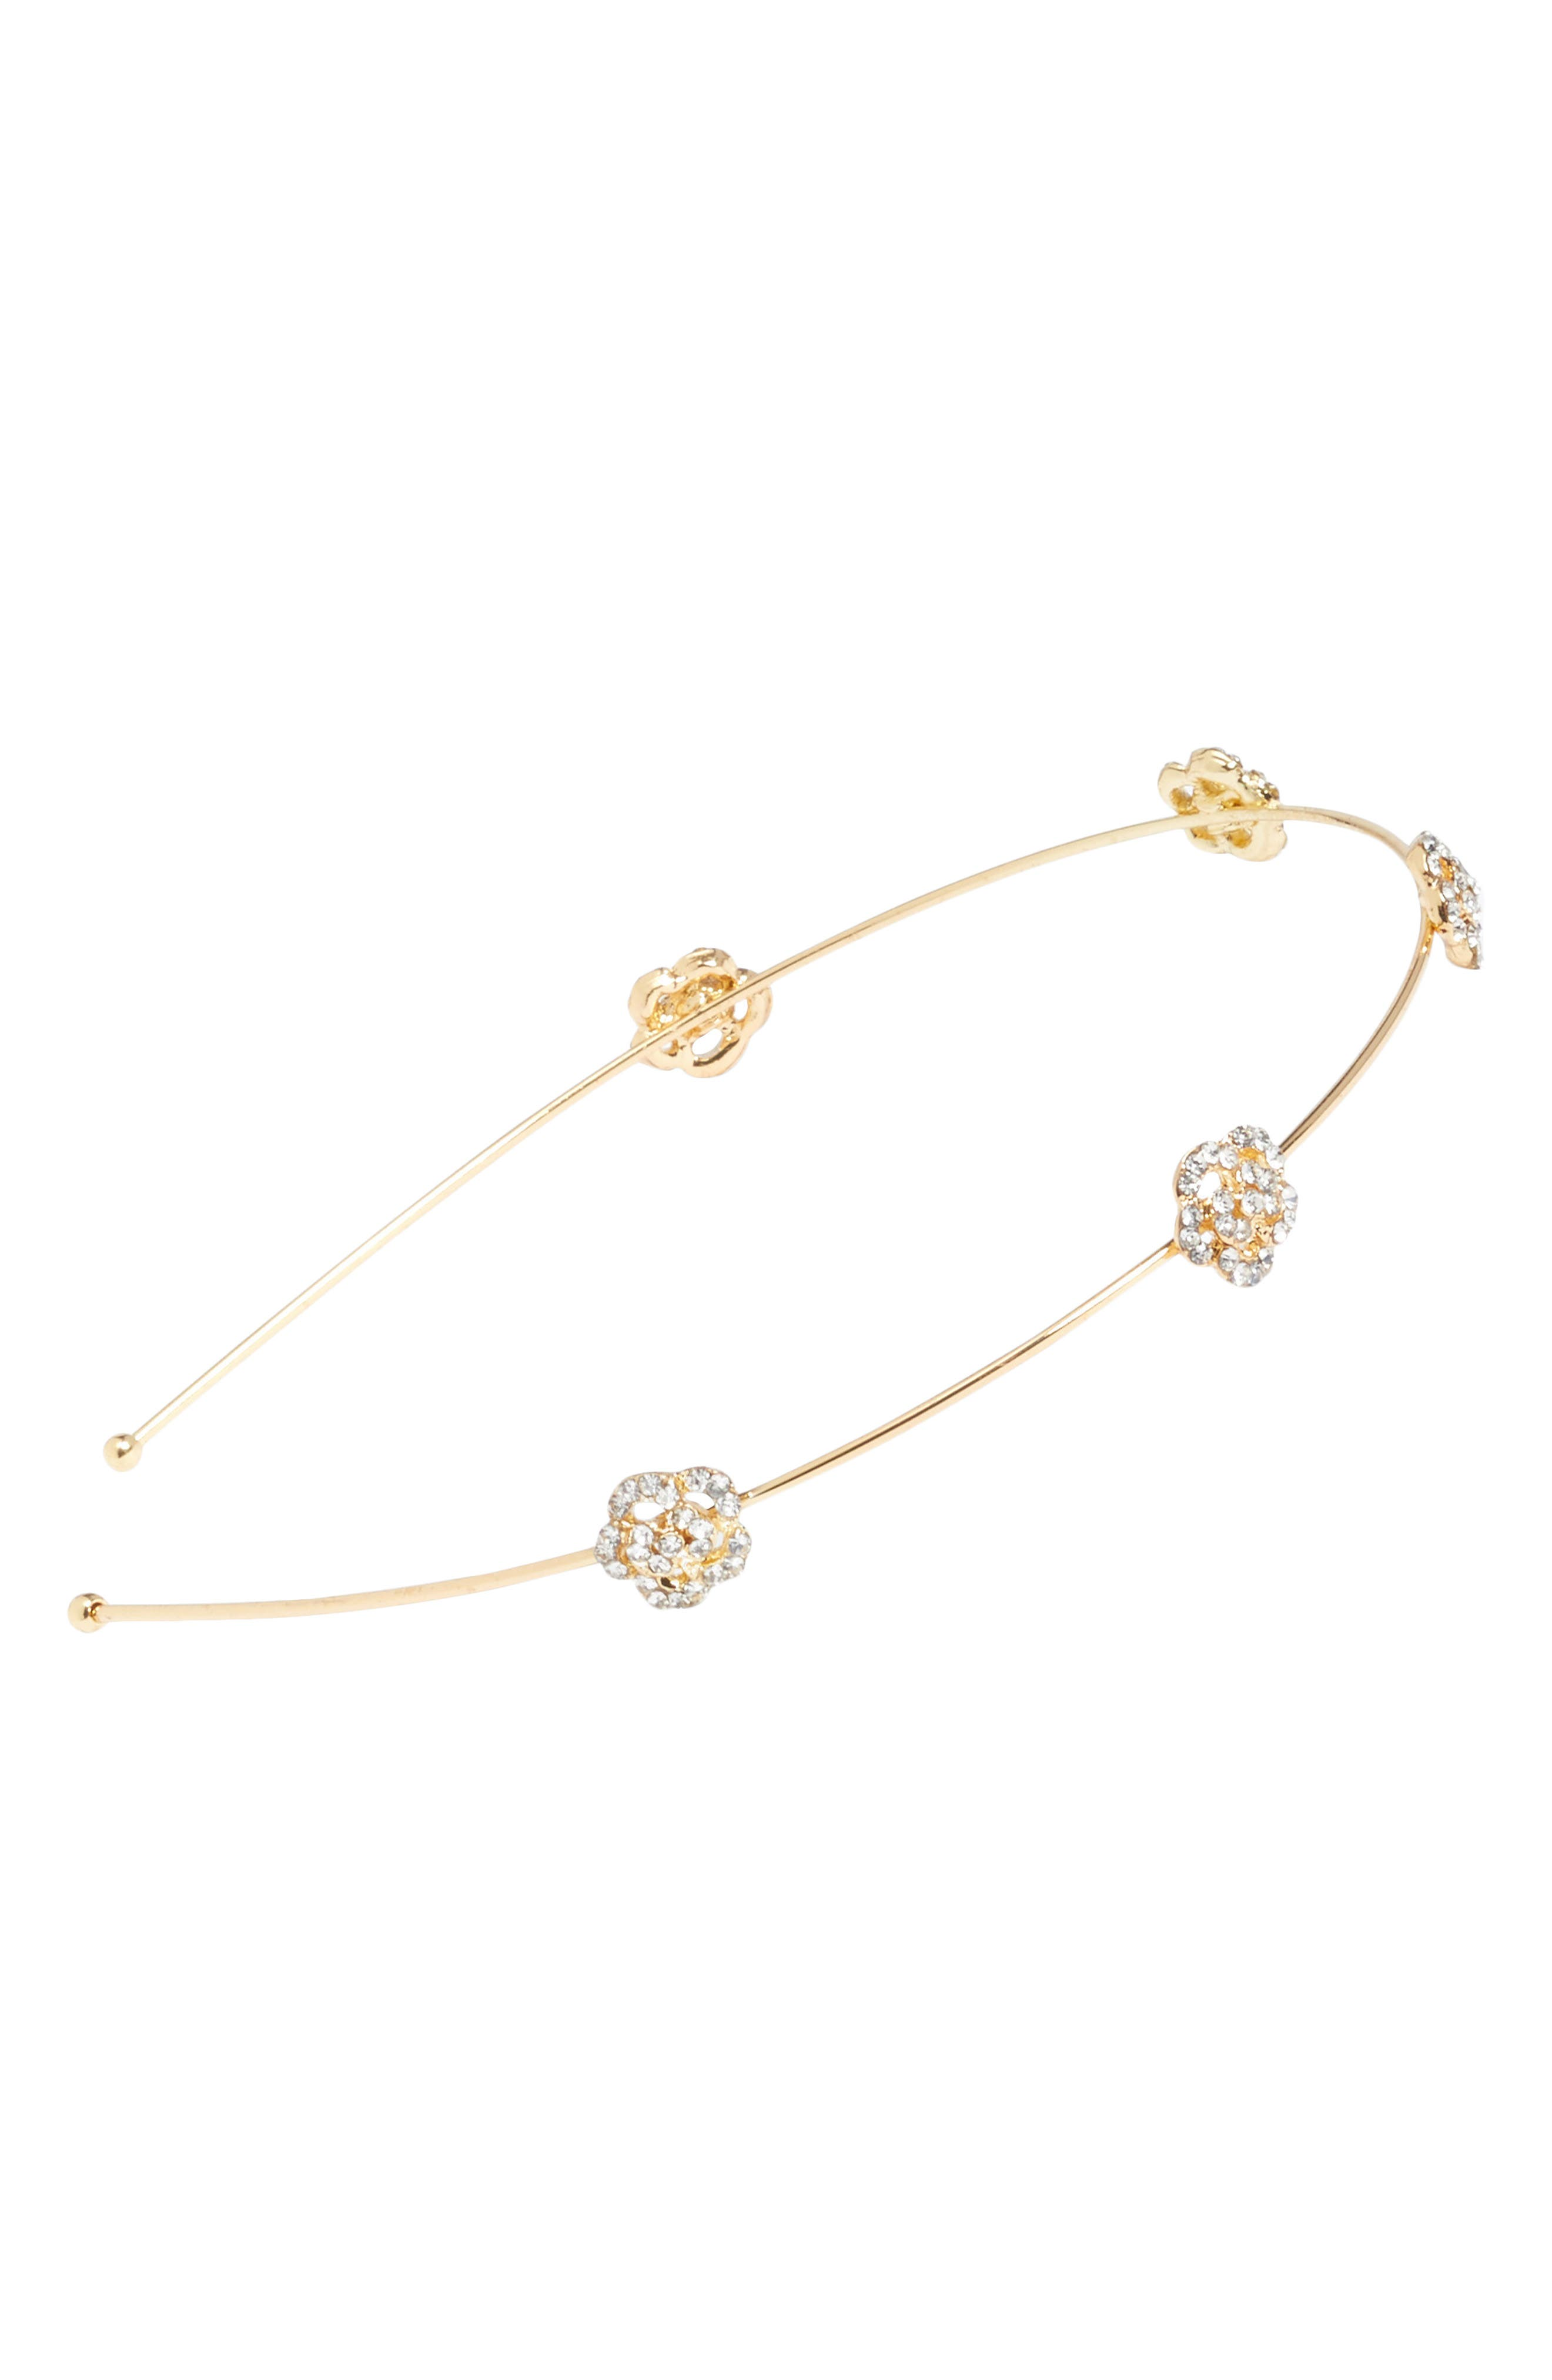 Main Image - Tasha Mini Rose Skinny Headband